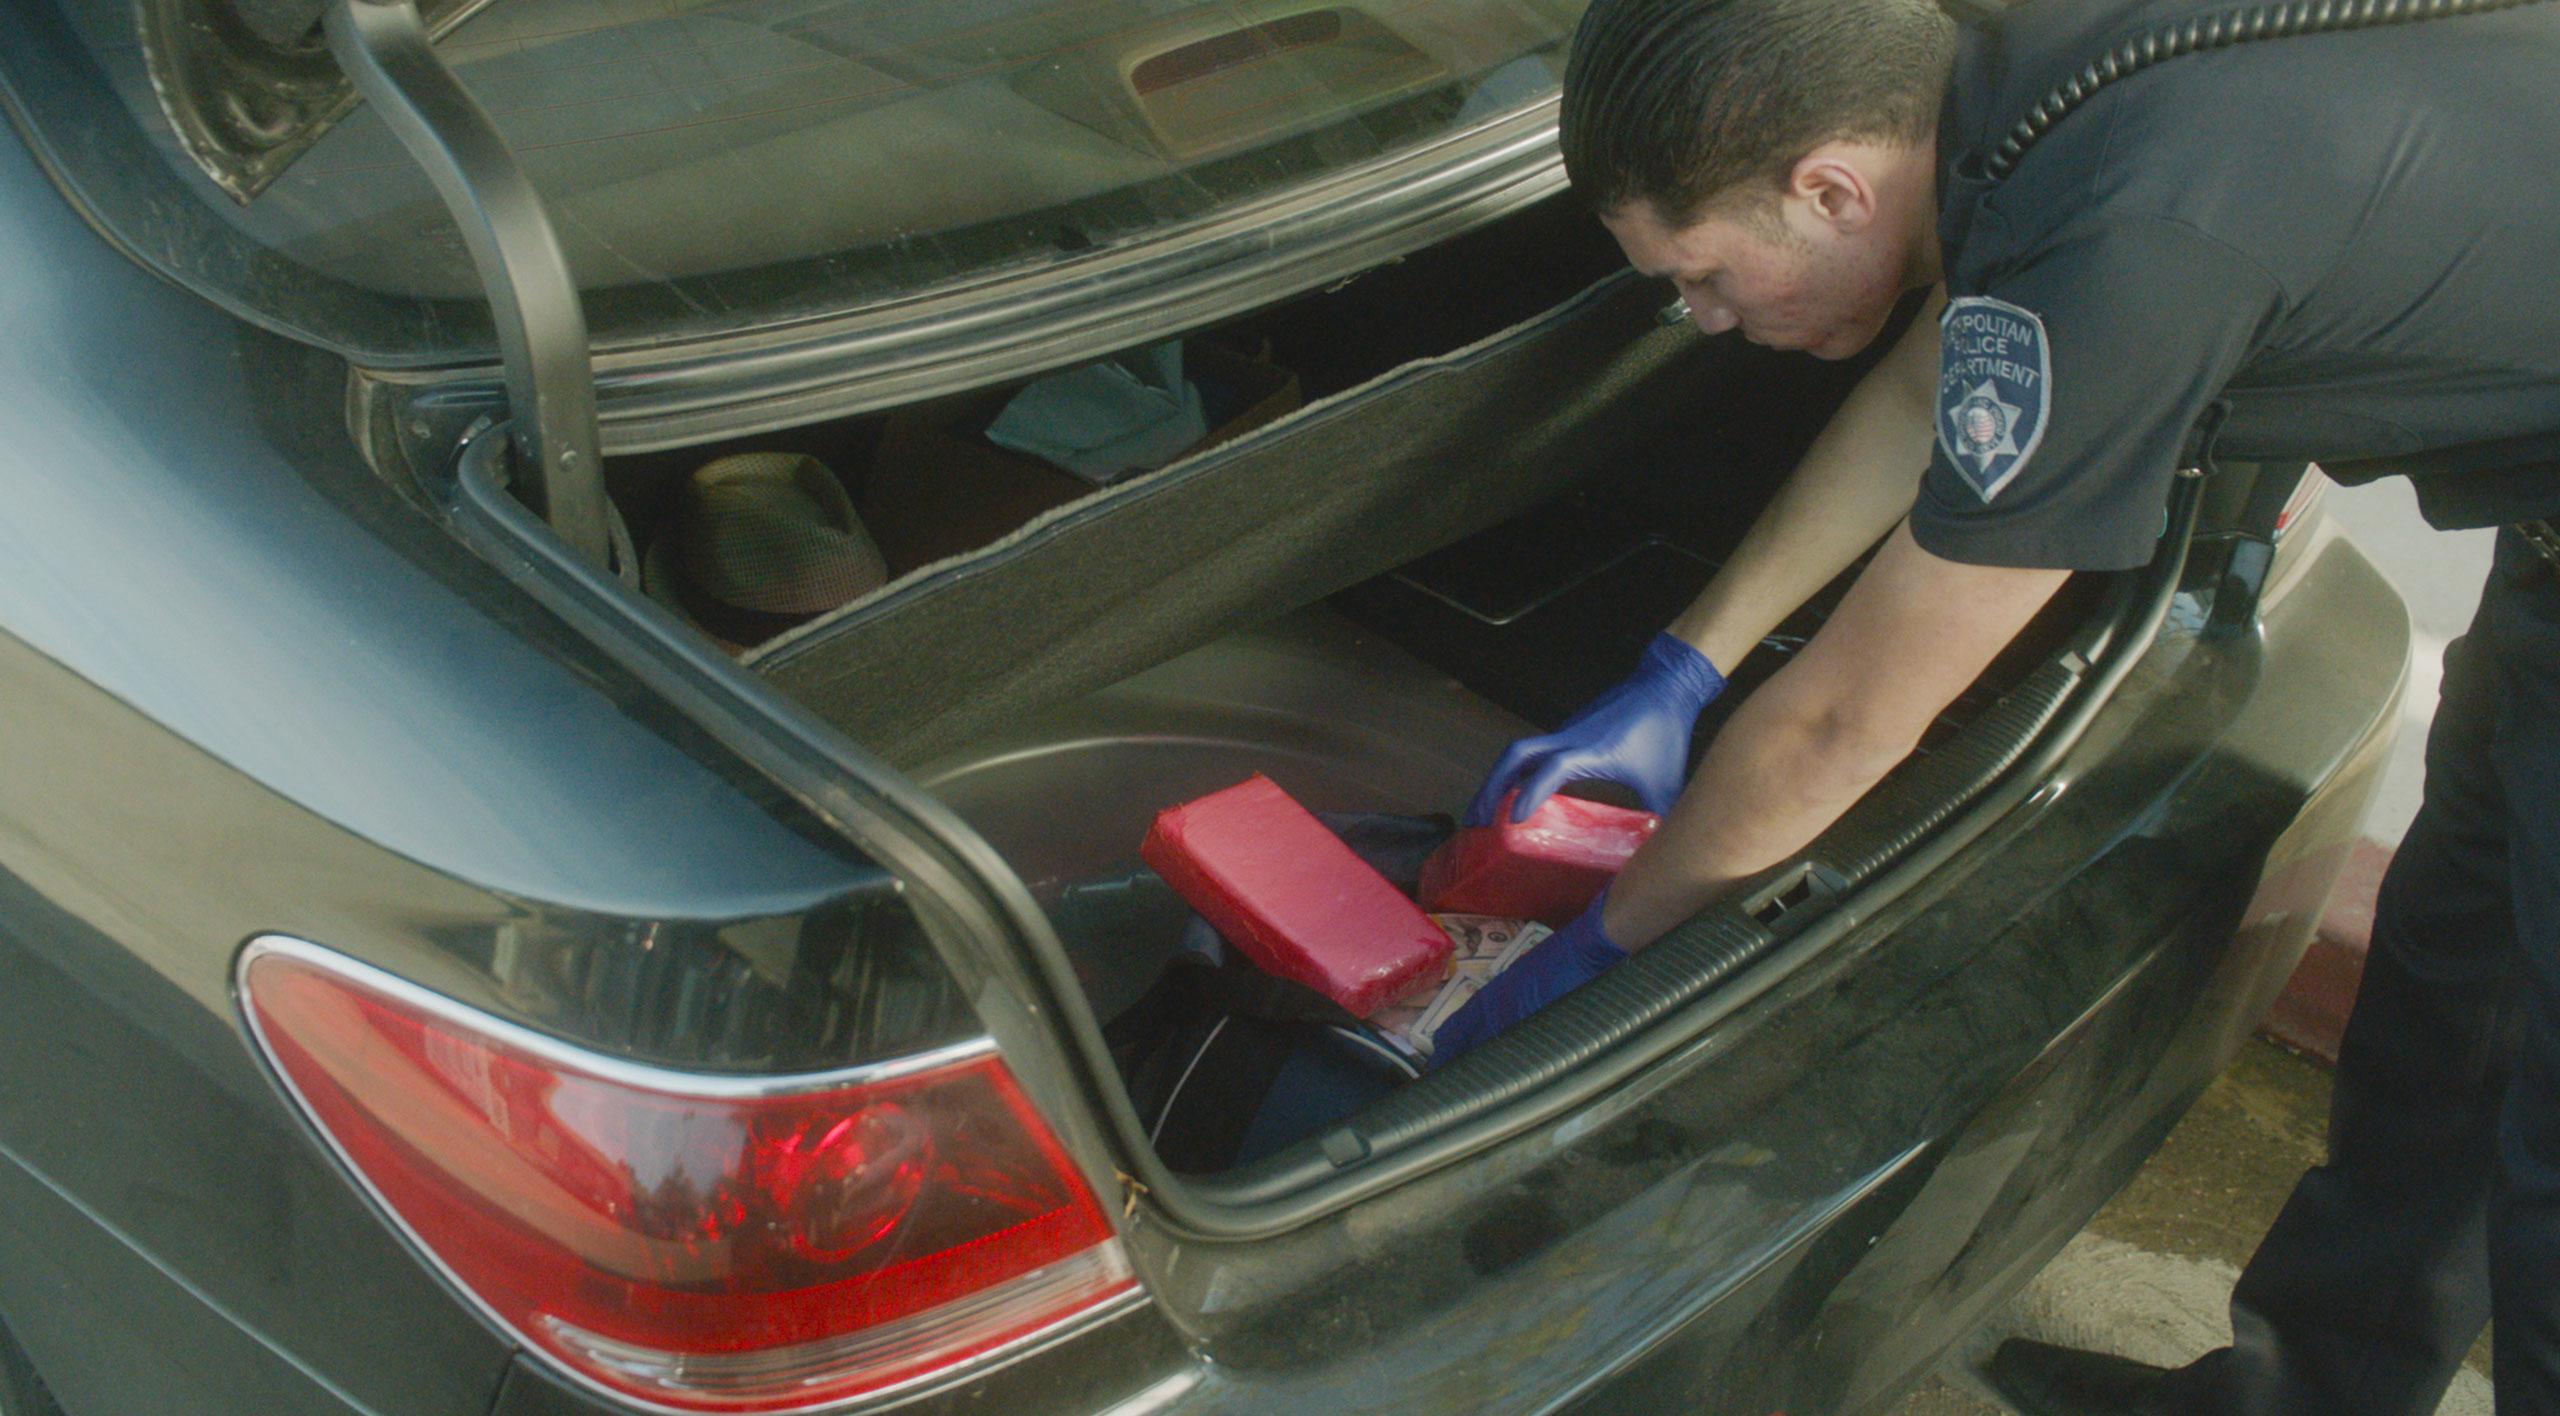 cop searching through car